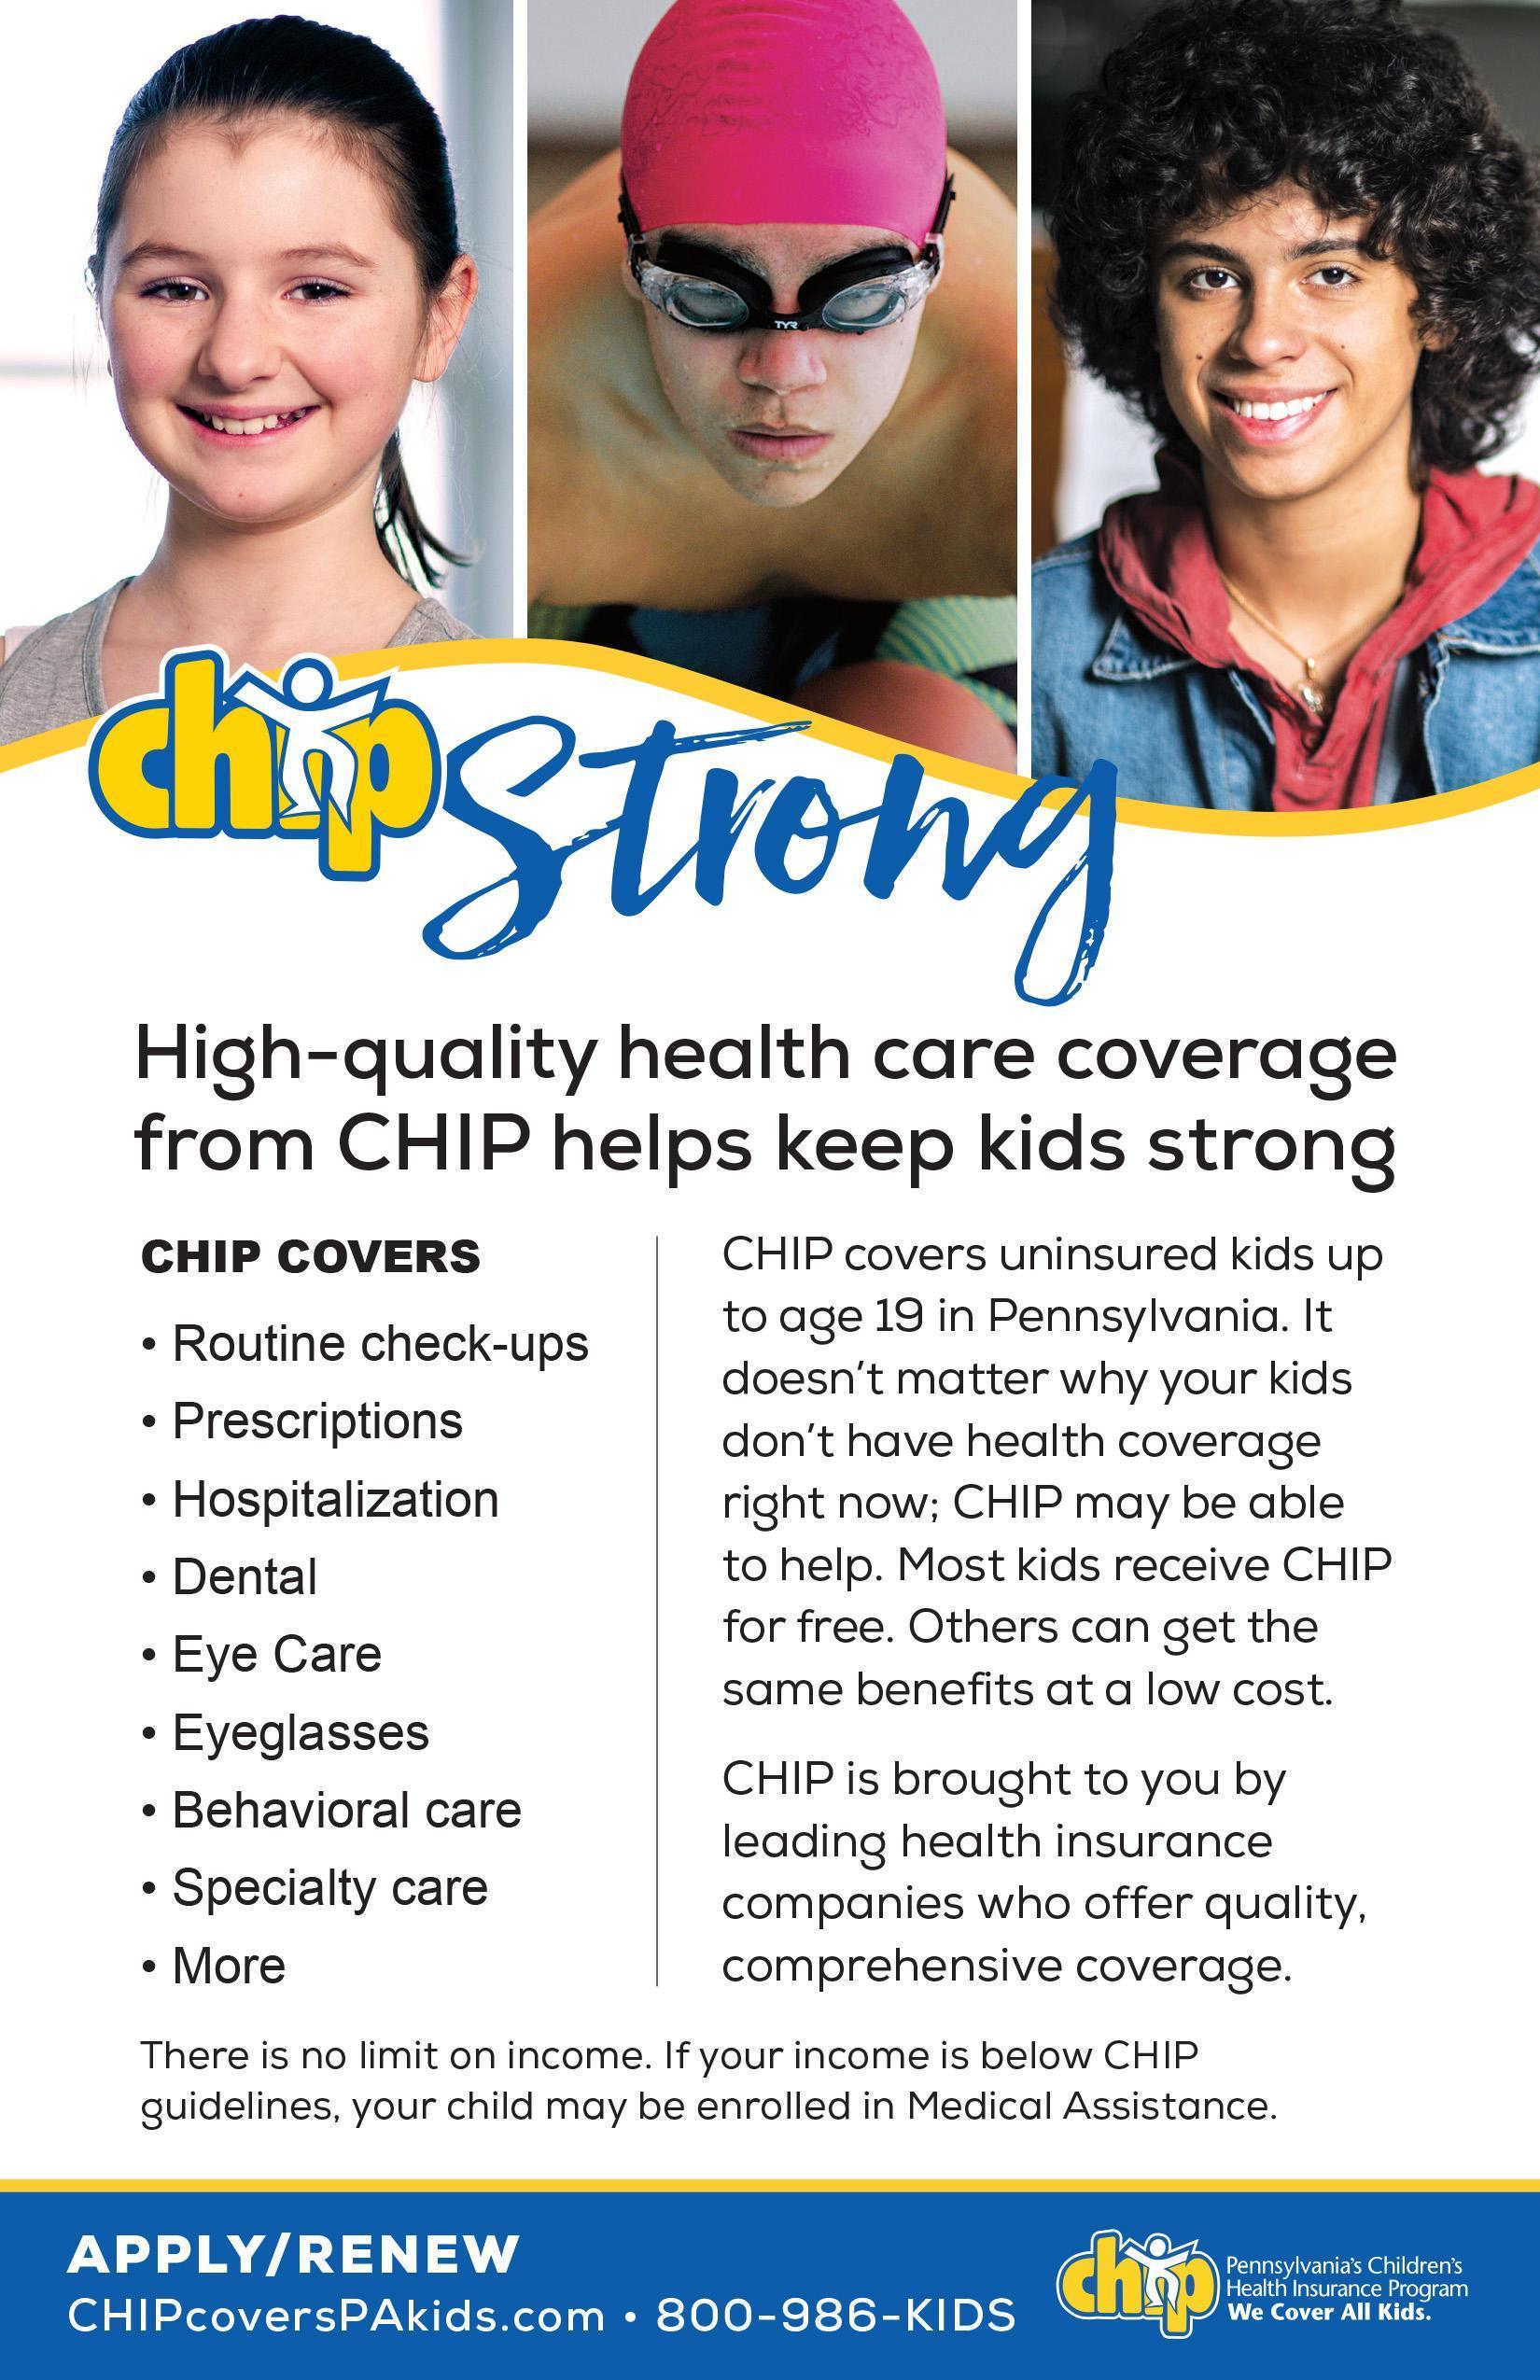 Children's Health Insurance Program (CHIP) flyer (English)